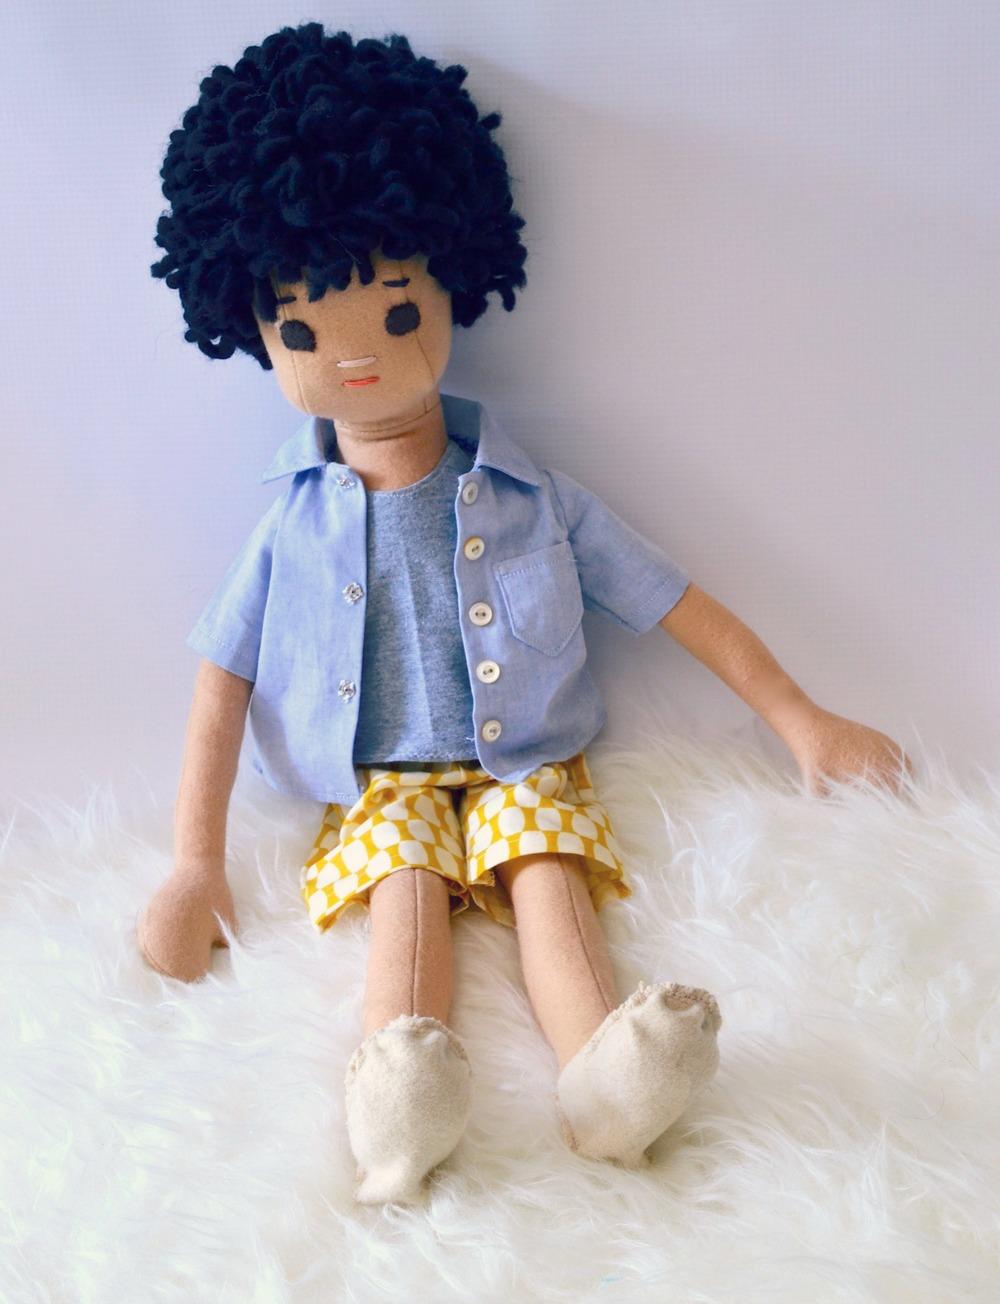 Black curly hair boy sitting1smaller.jpg